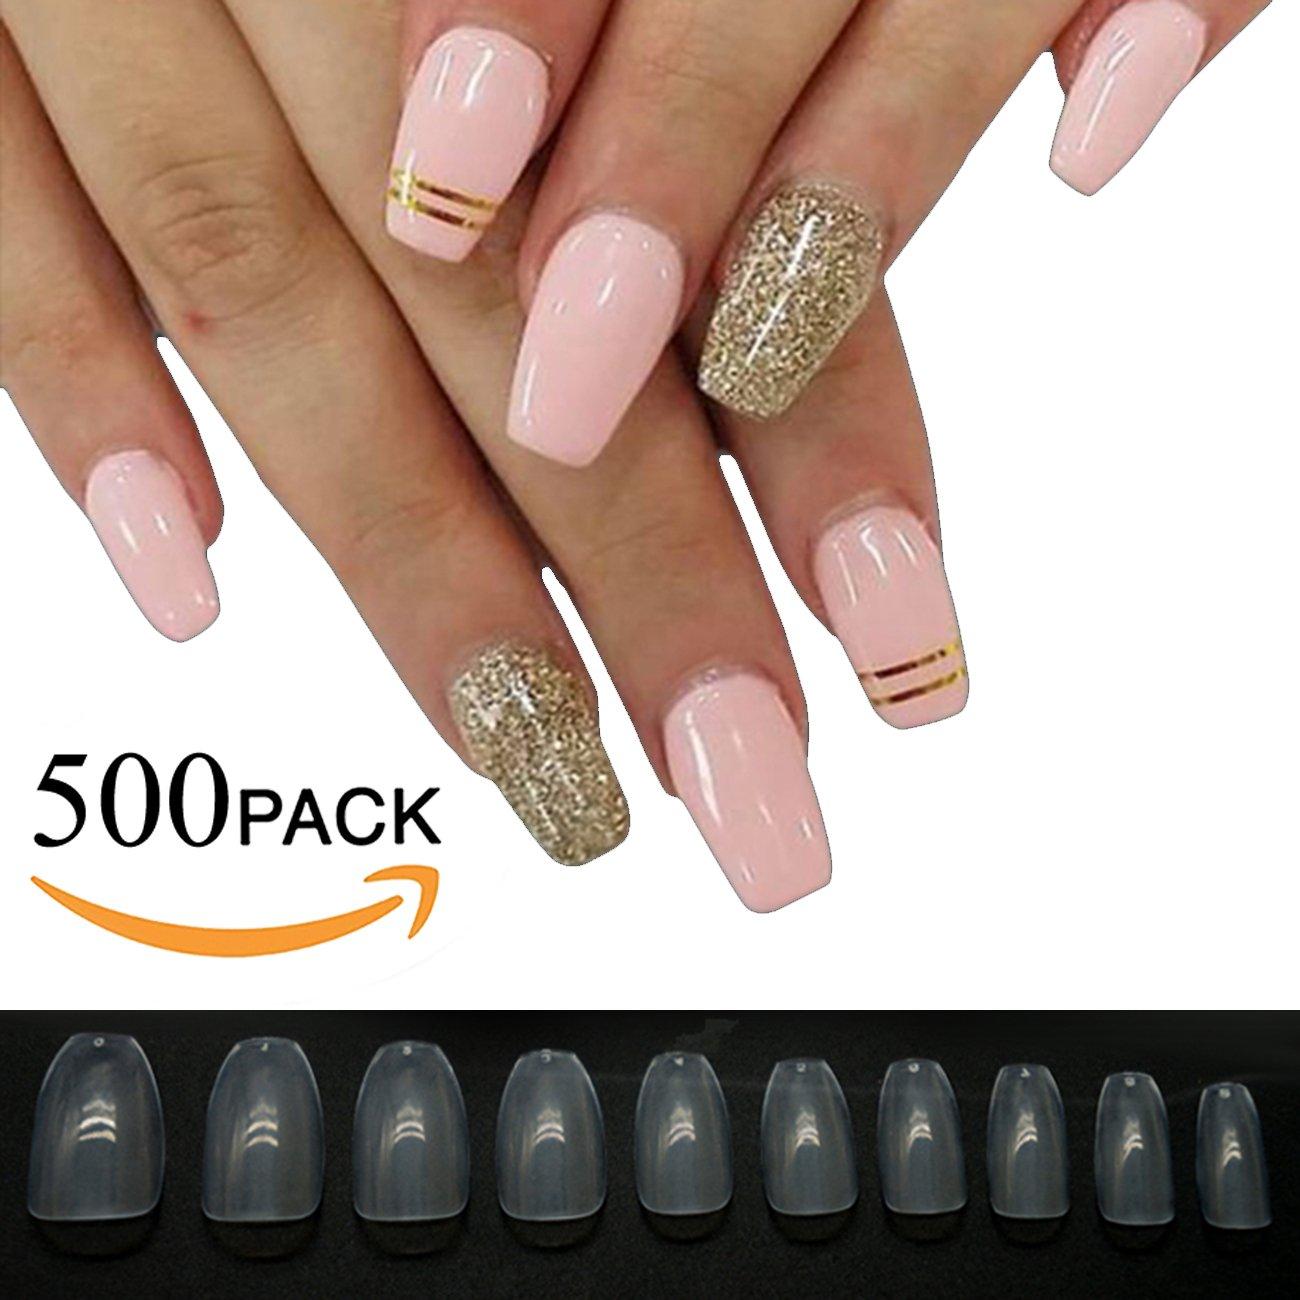 Amazon.com : 500pcs Coffin Nails Nail Tips Full Cover Acrylic False ...